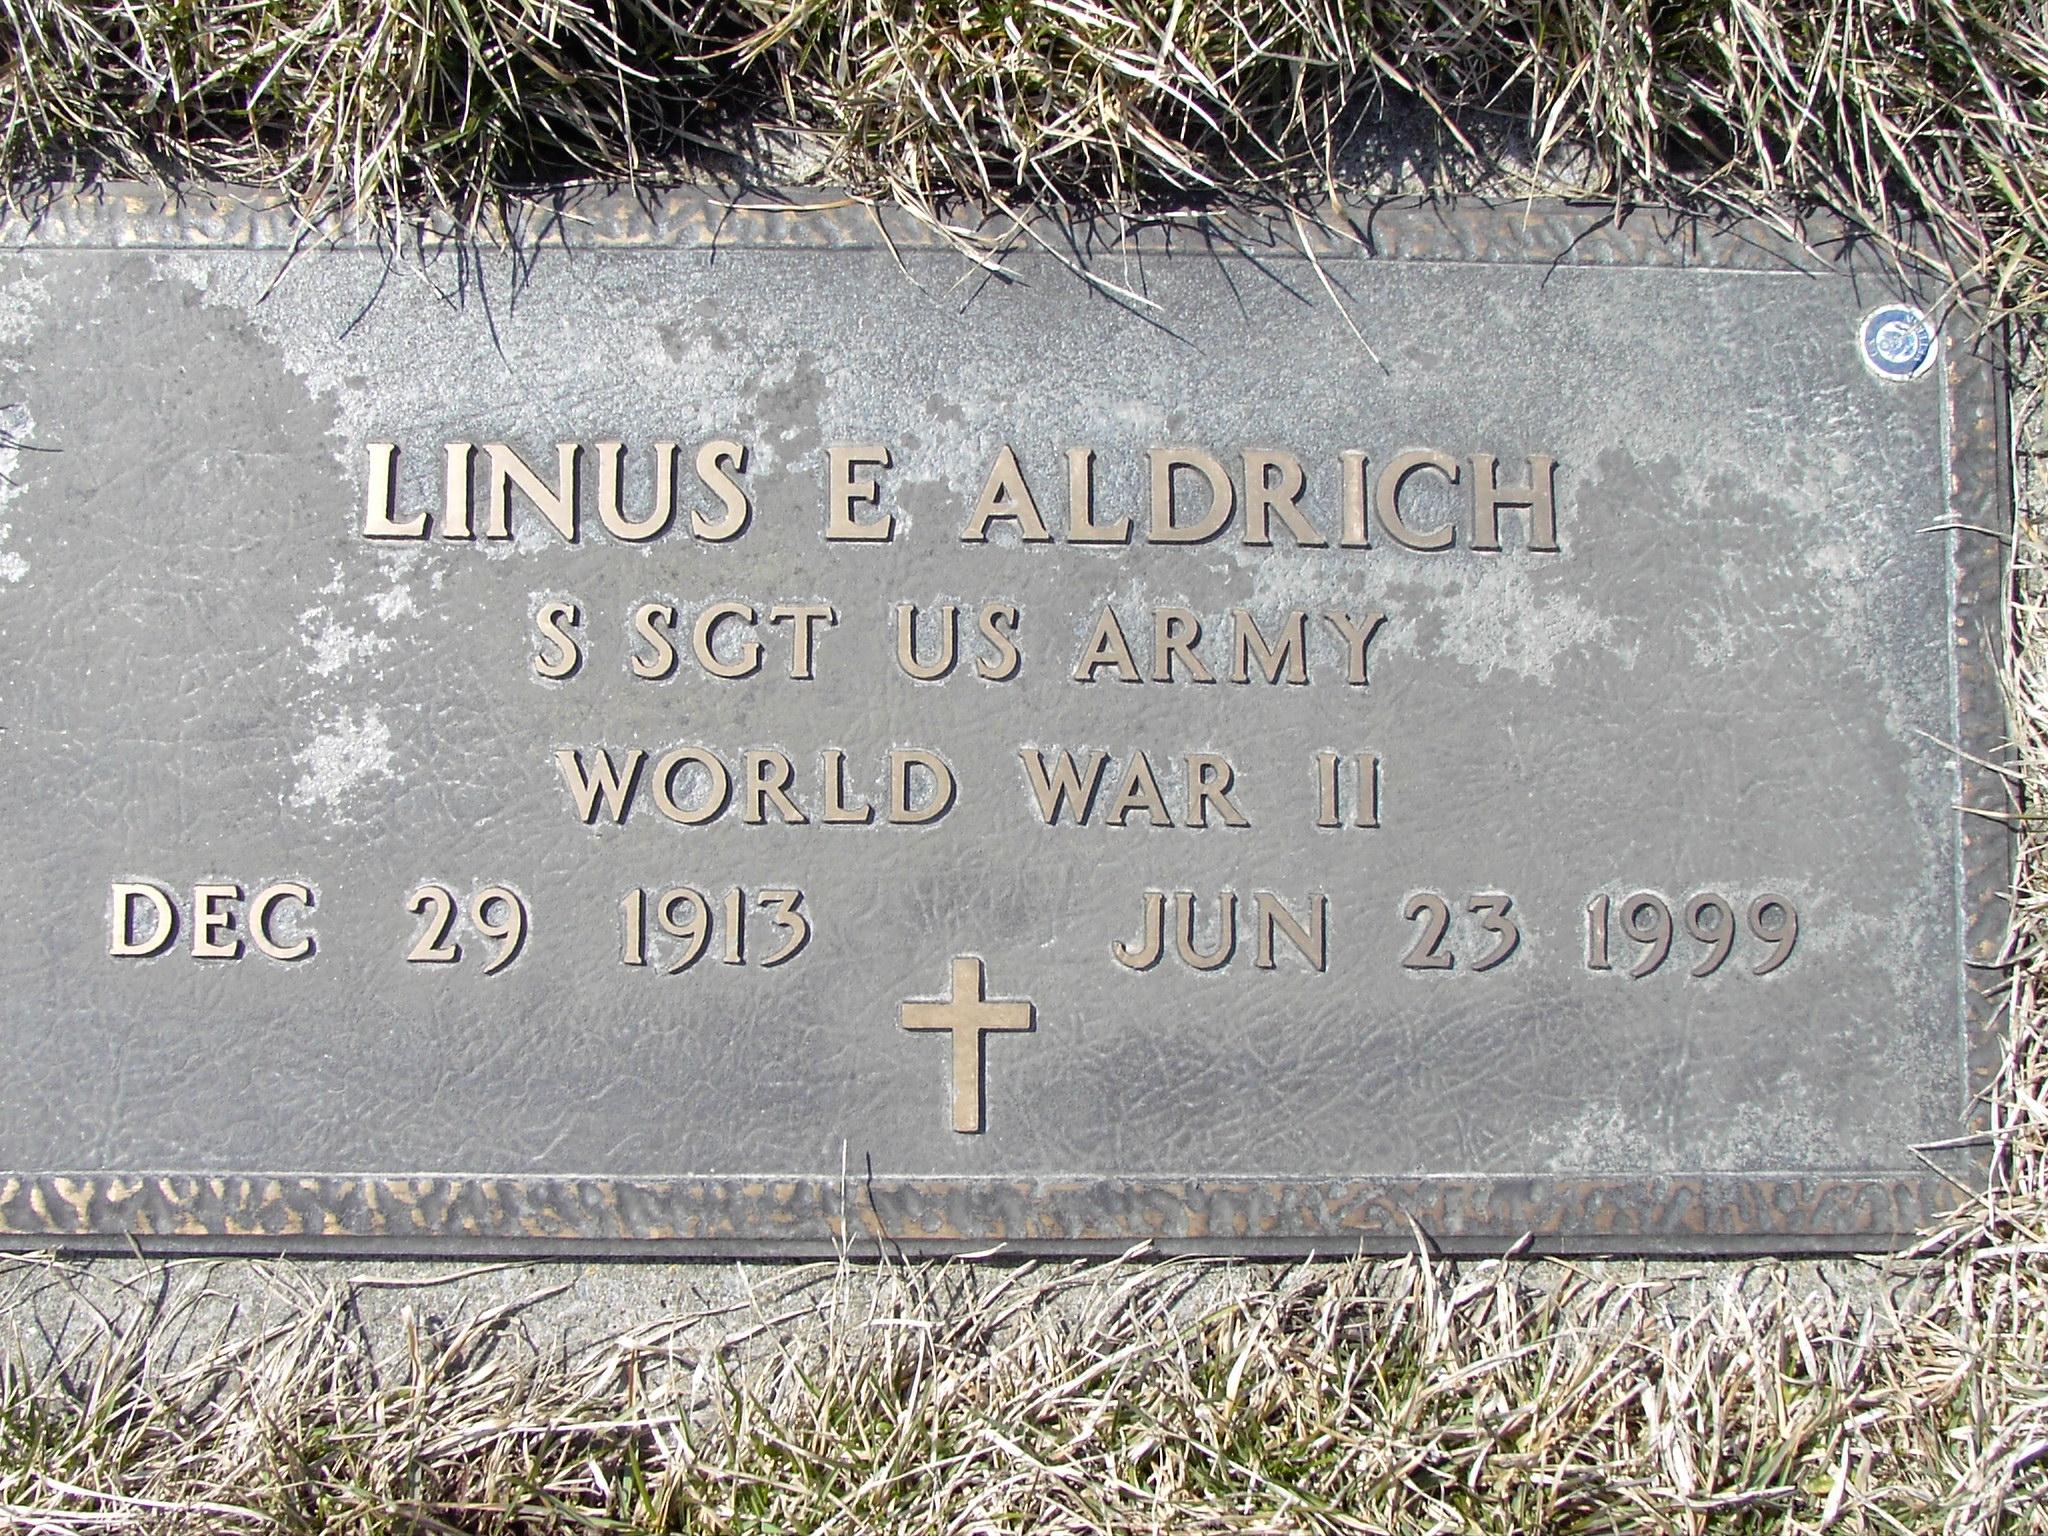 Linus Evan Shorty Aldrich